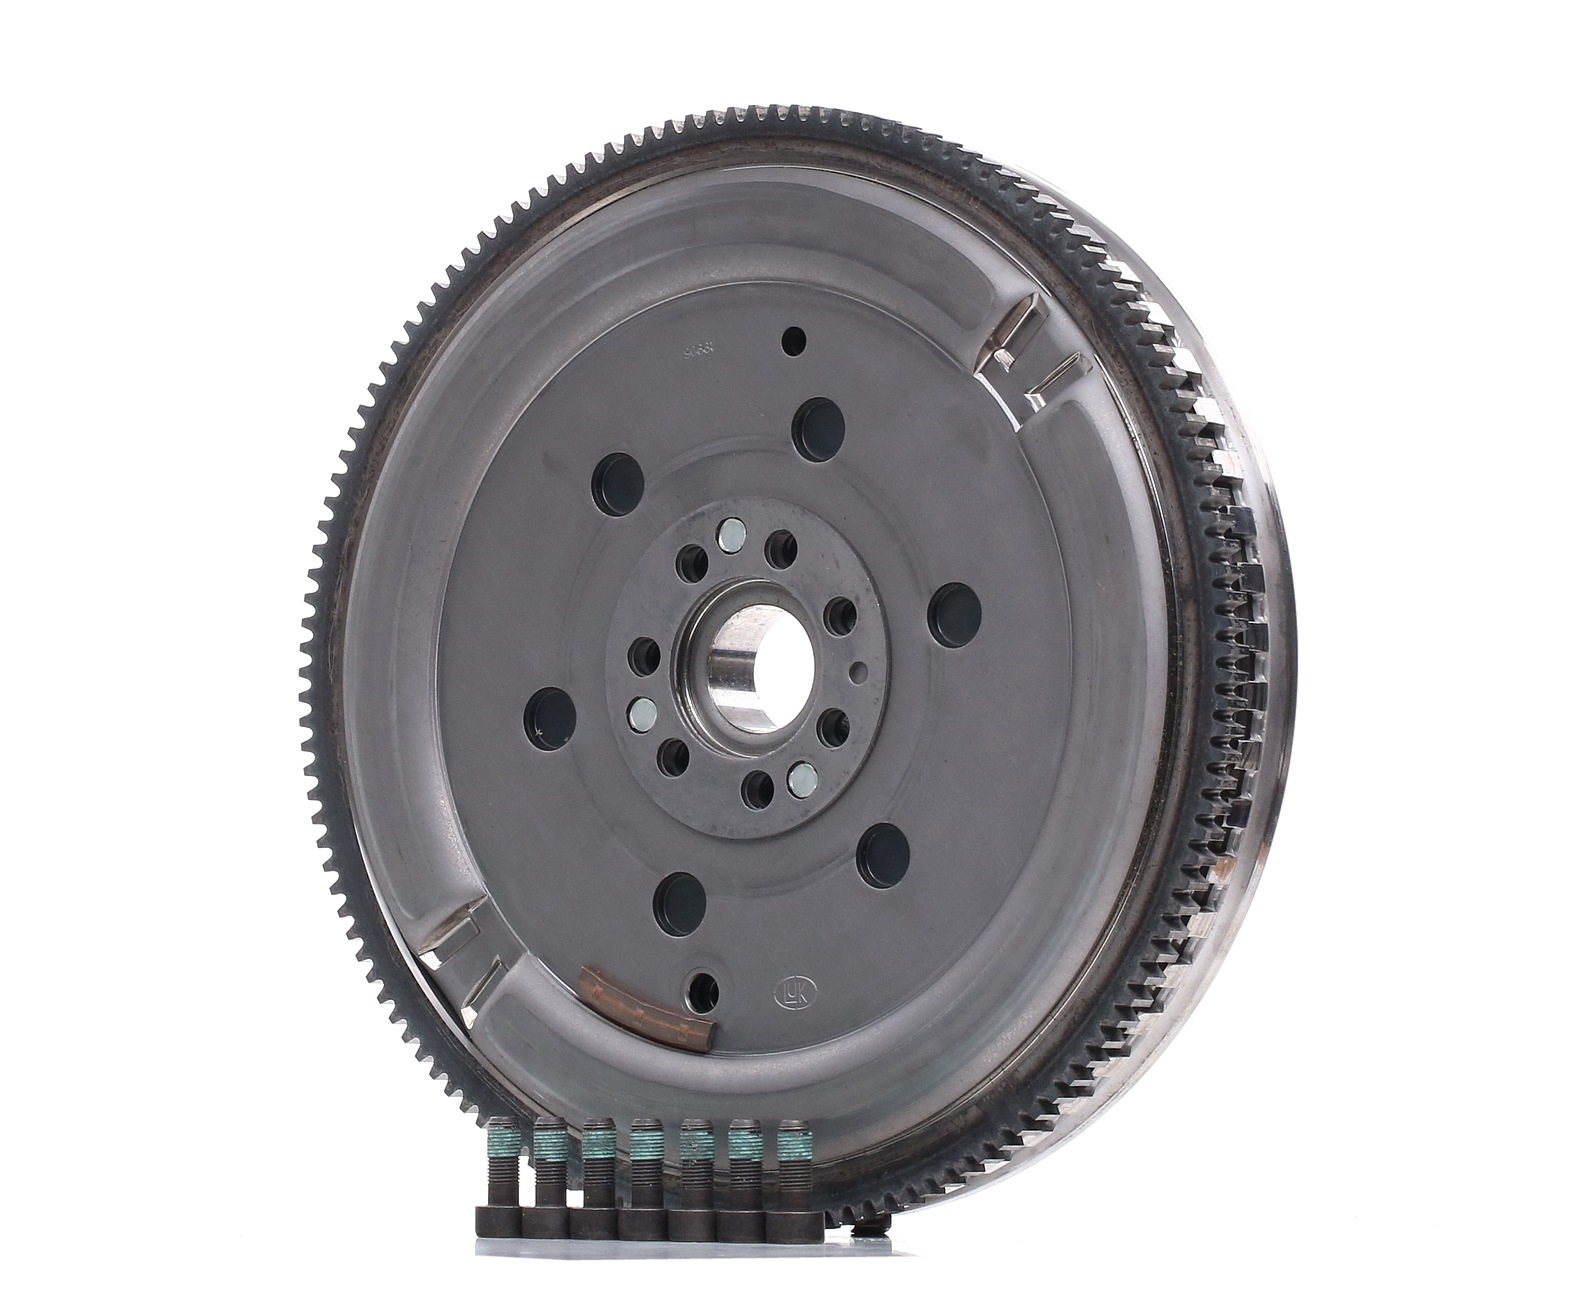 Origine Boîte de vitesses LuK 415 0400 10 ()